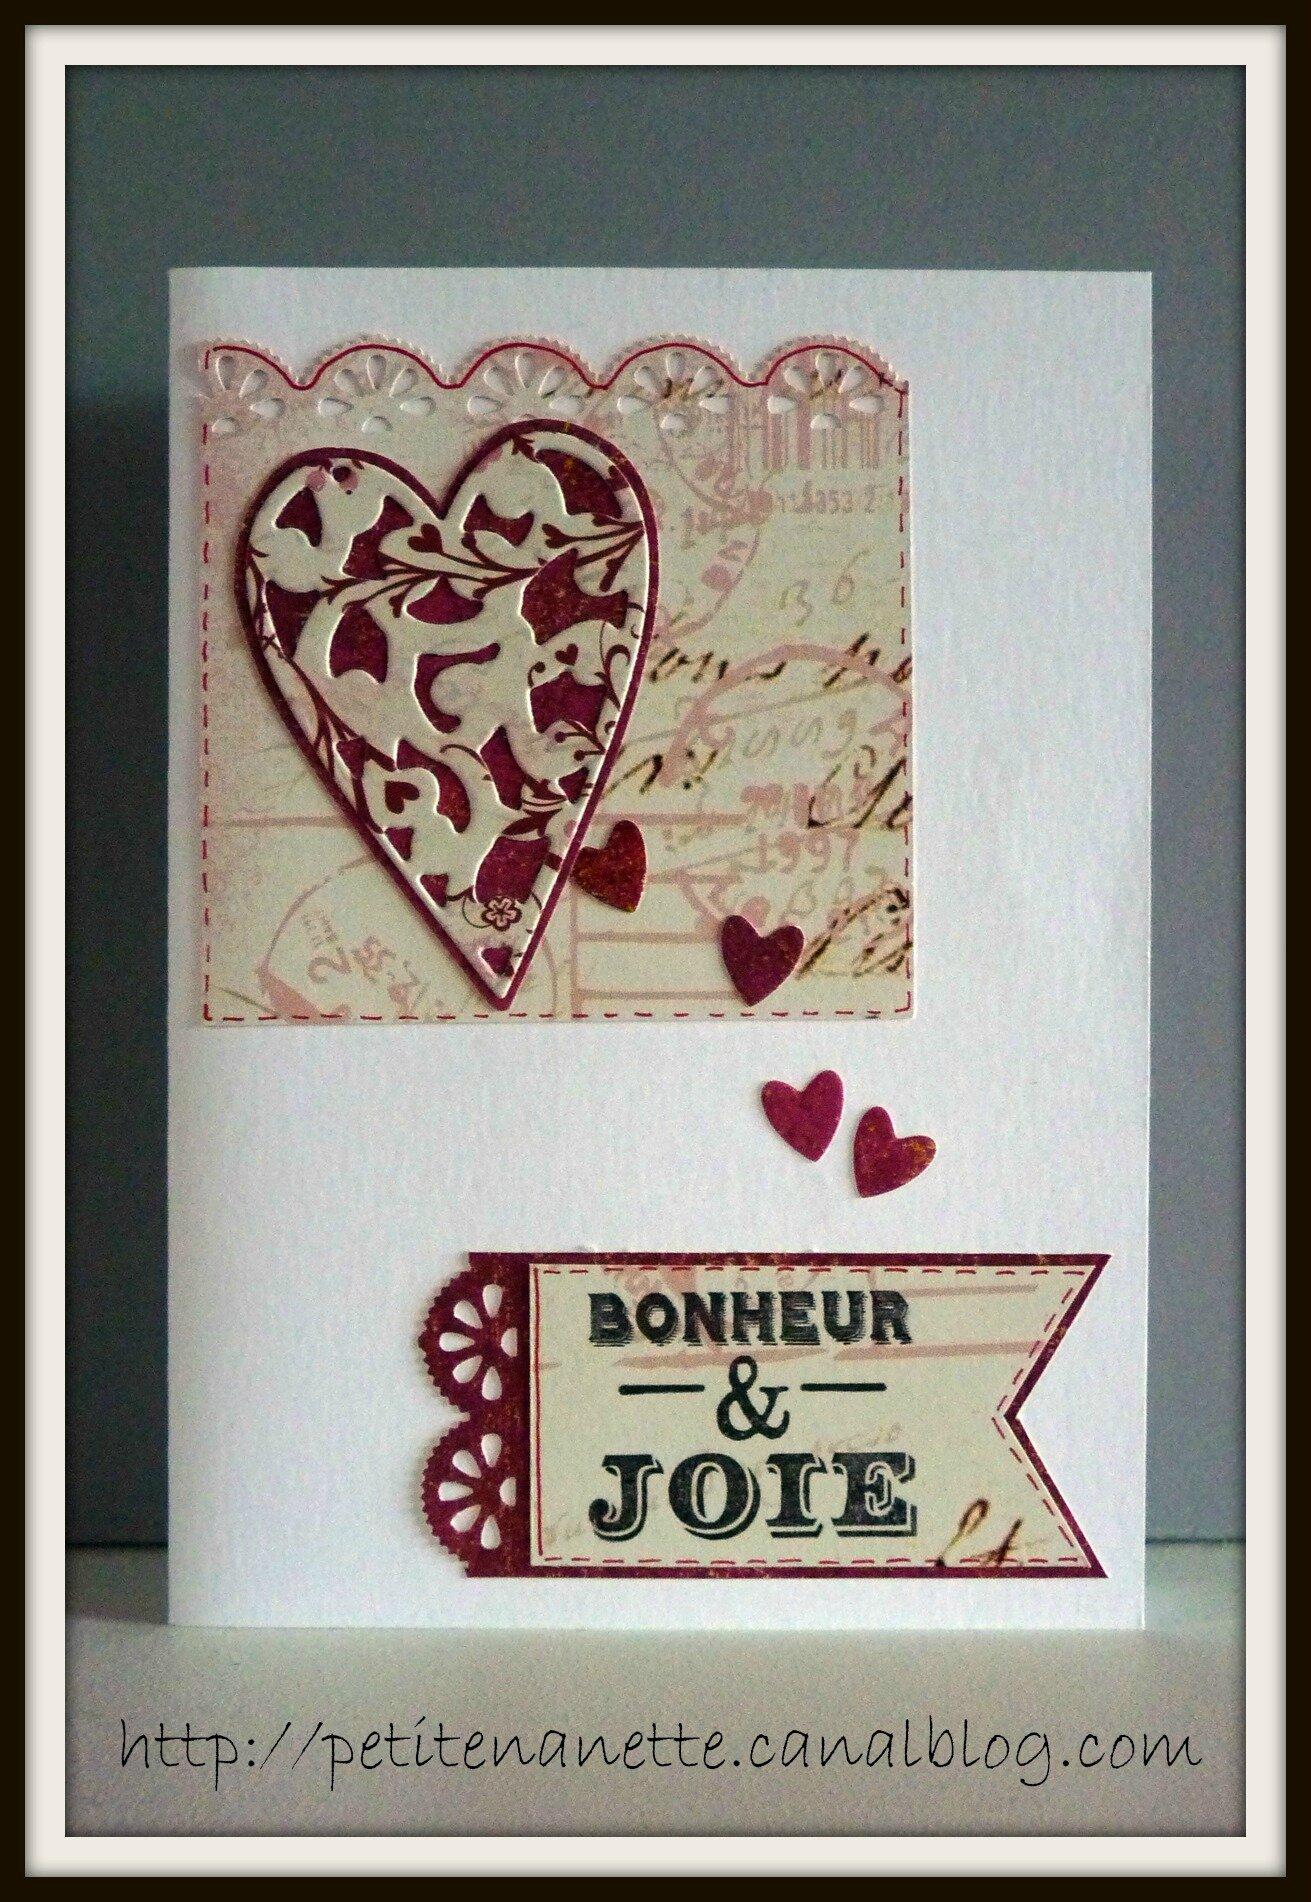 Romantique...